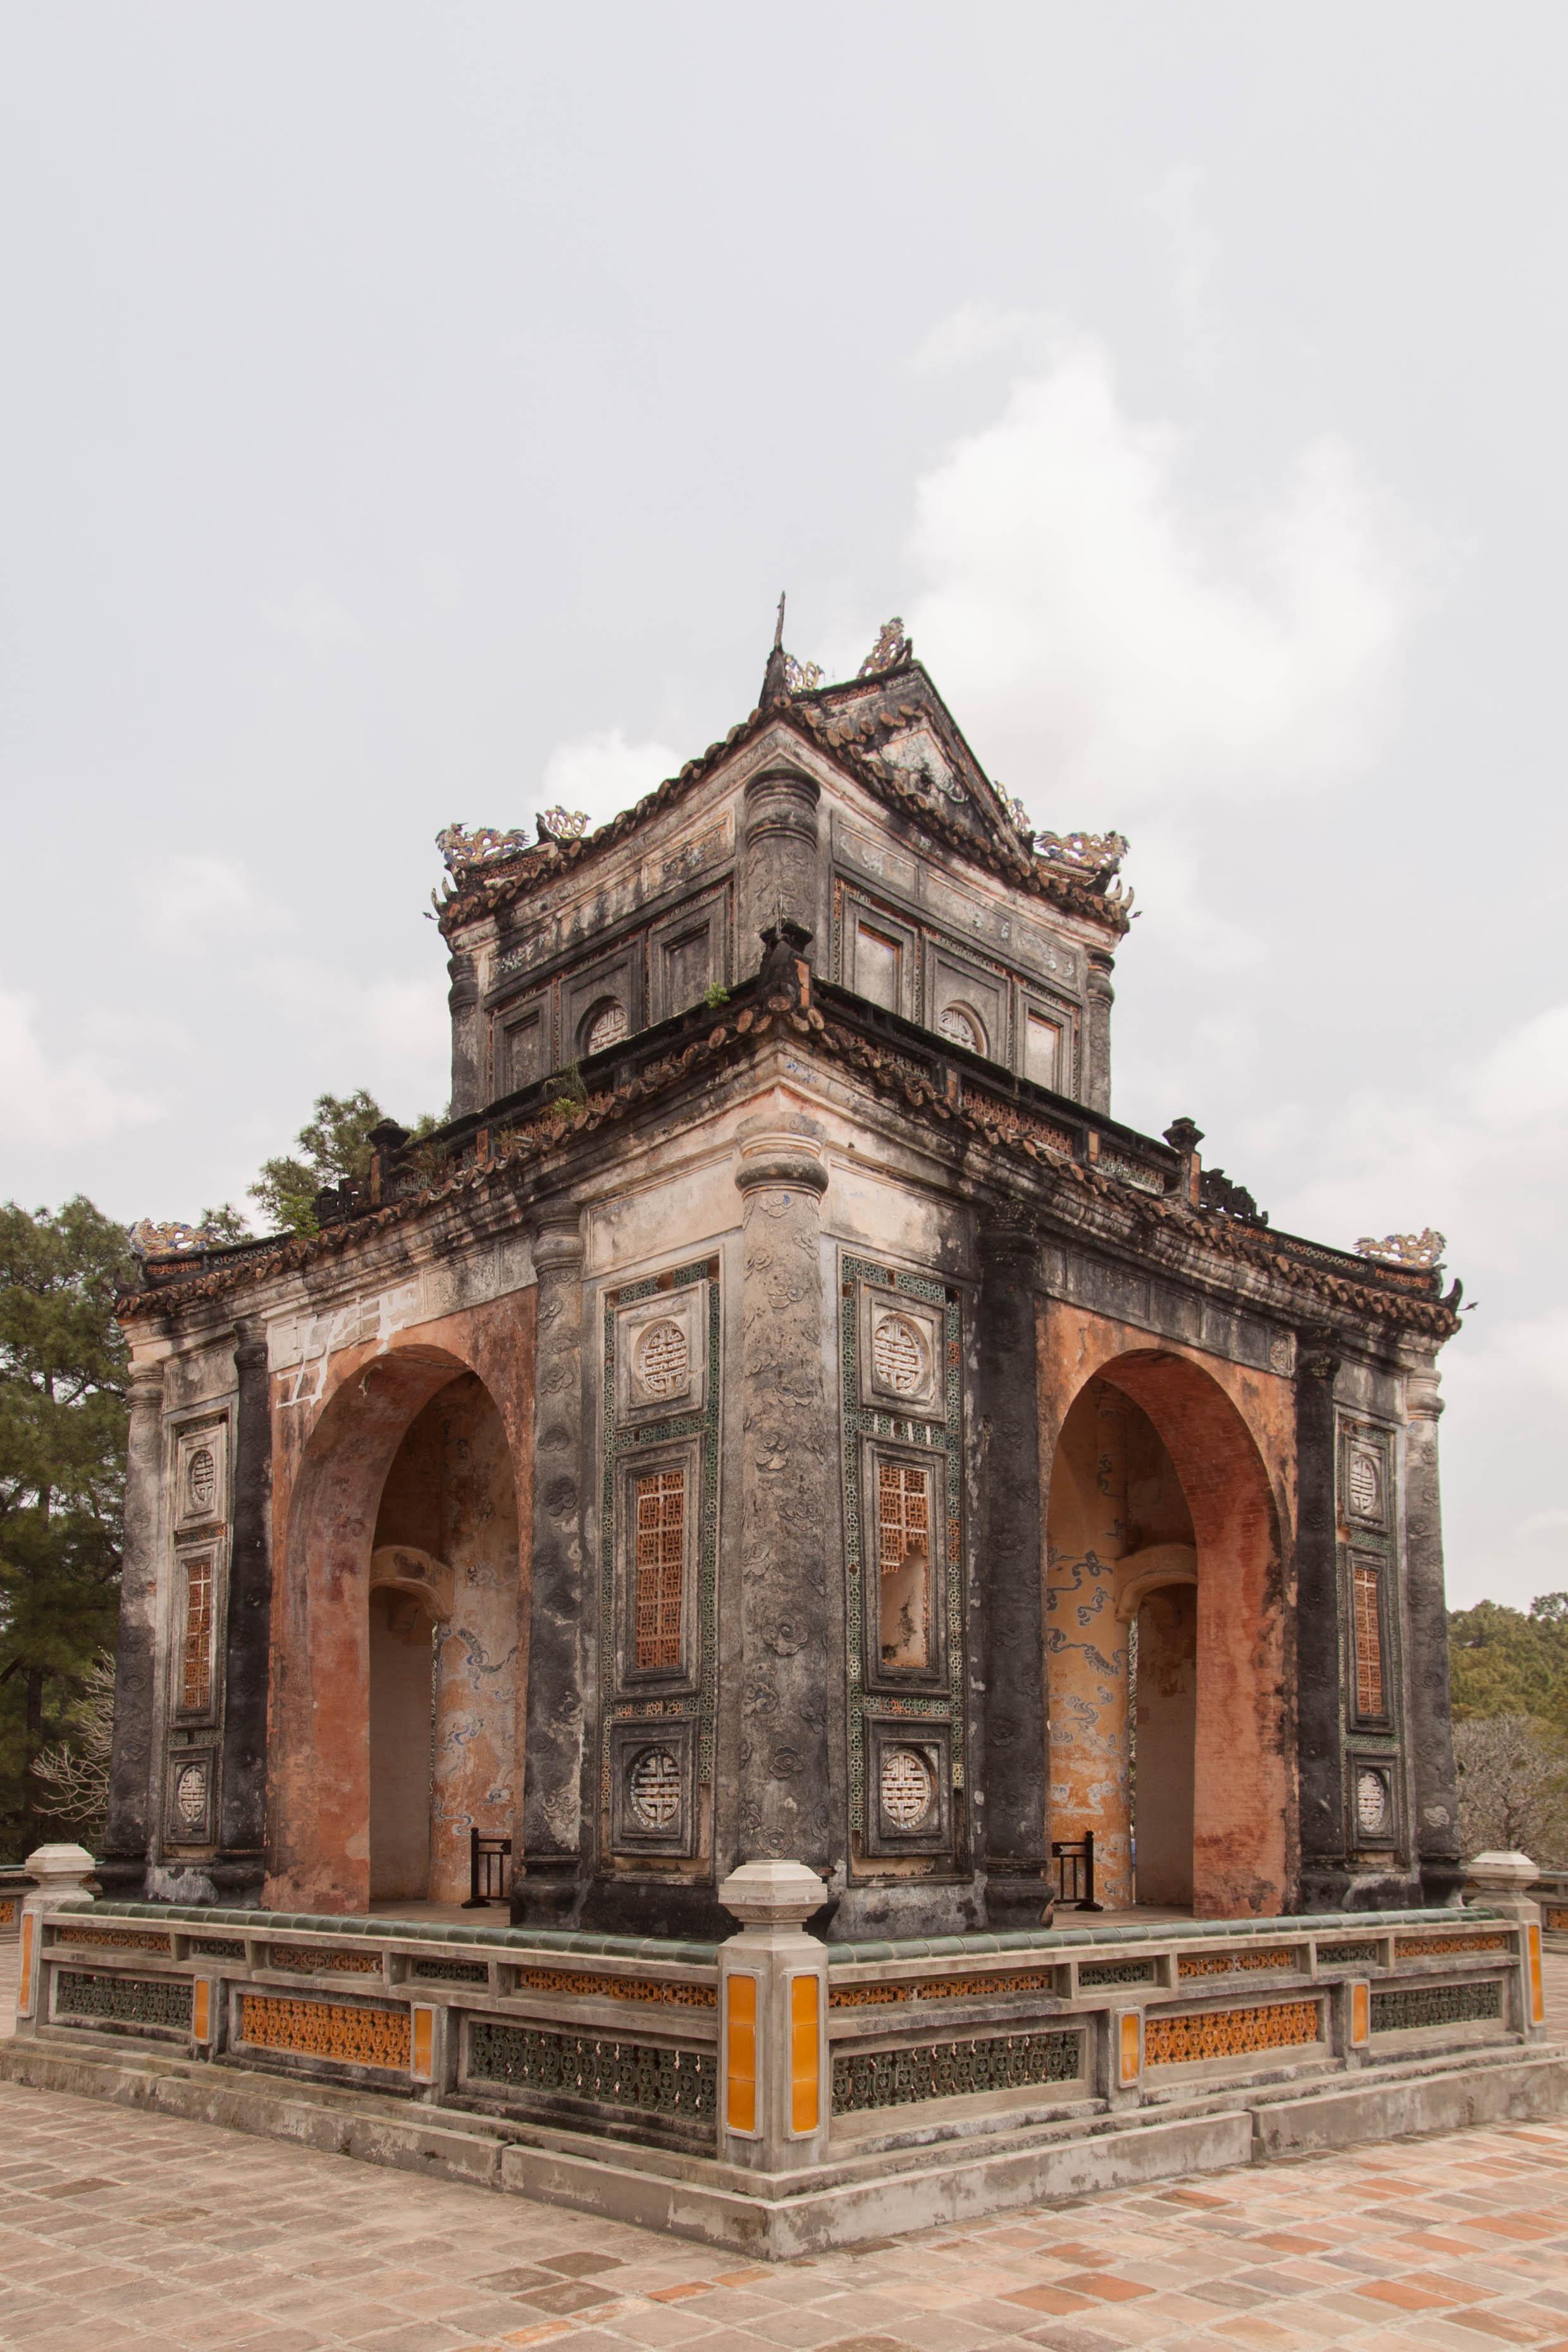 stele pavilion - hue, vietnam